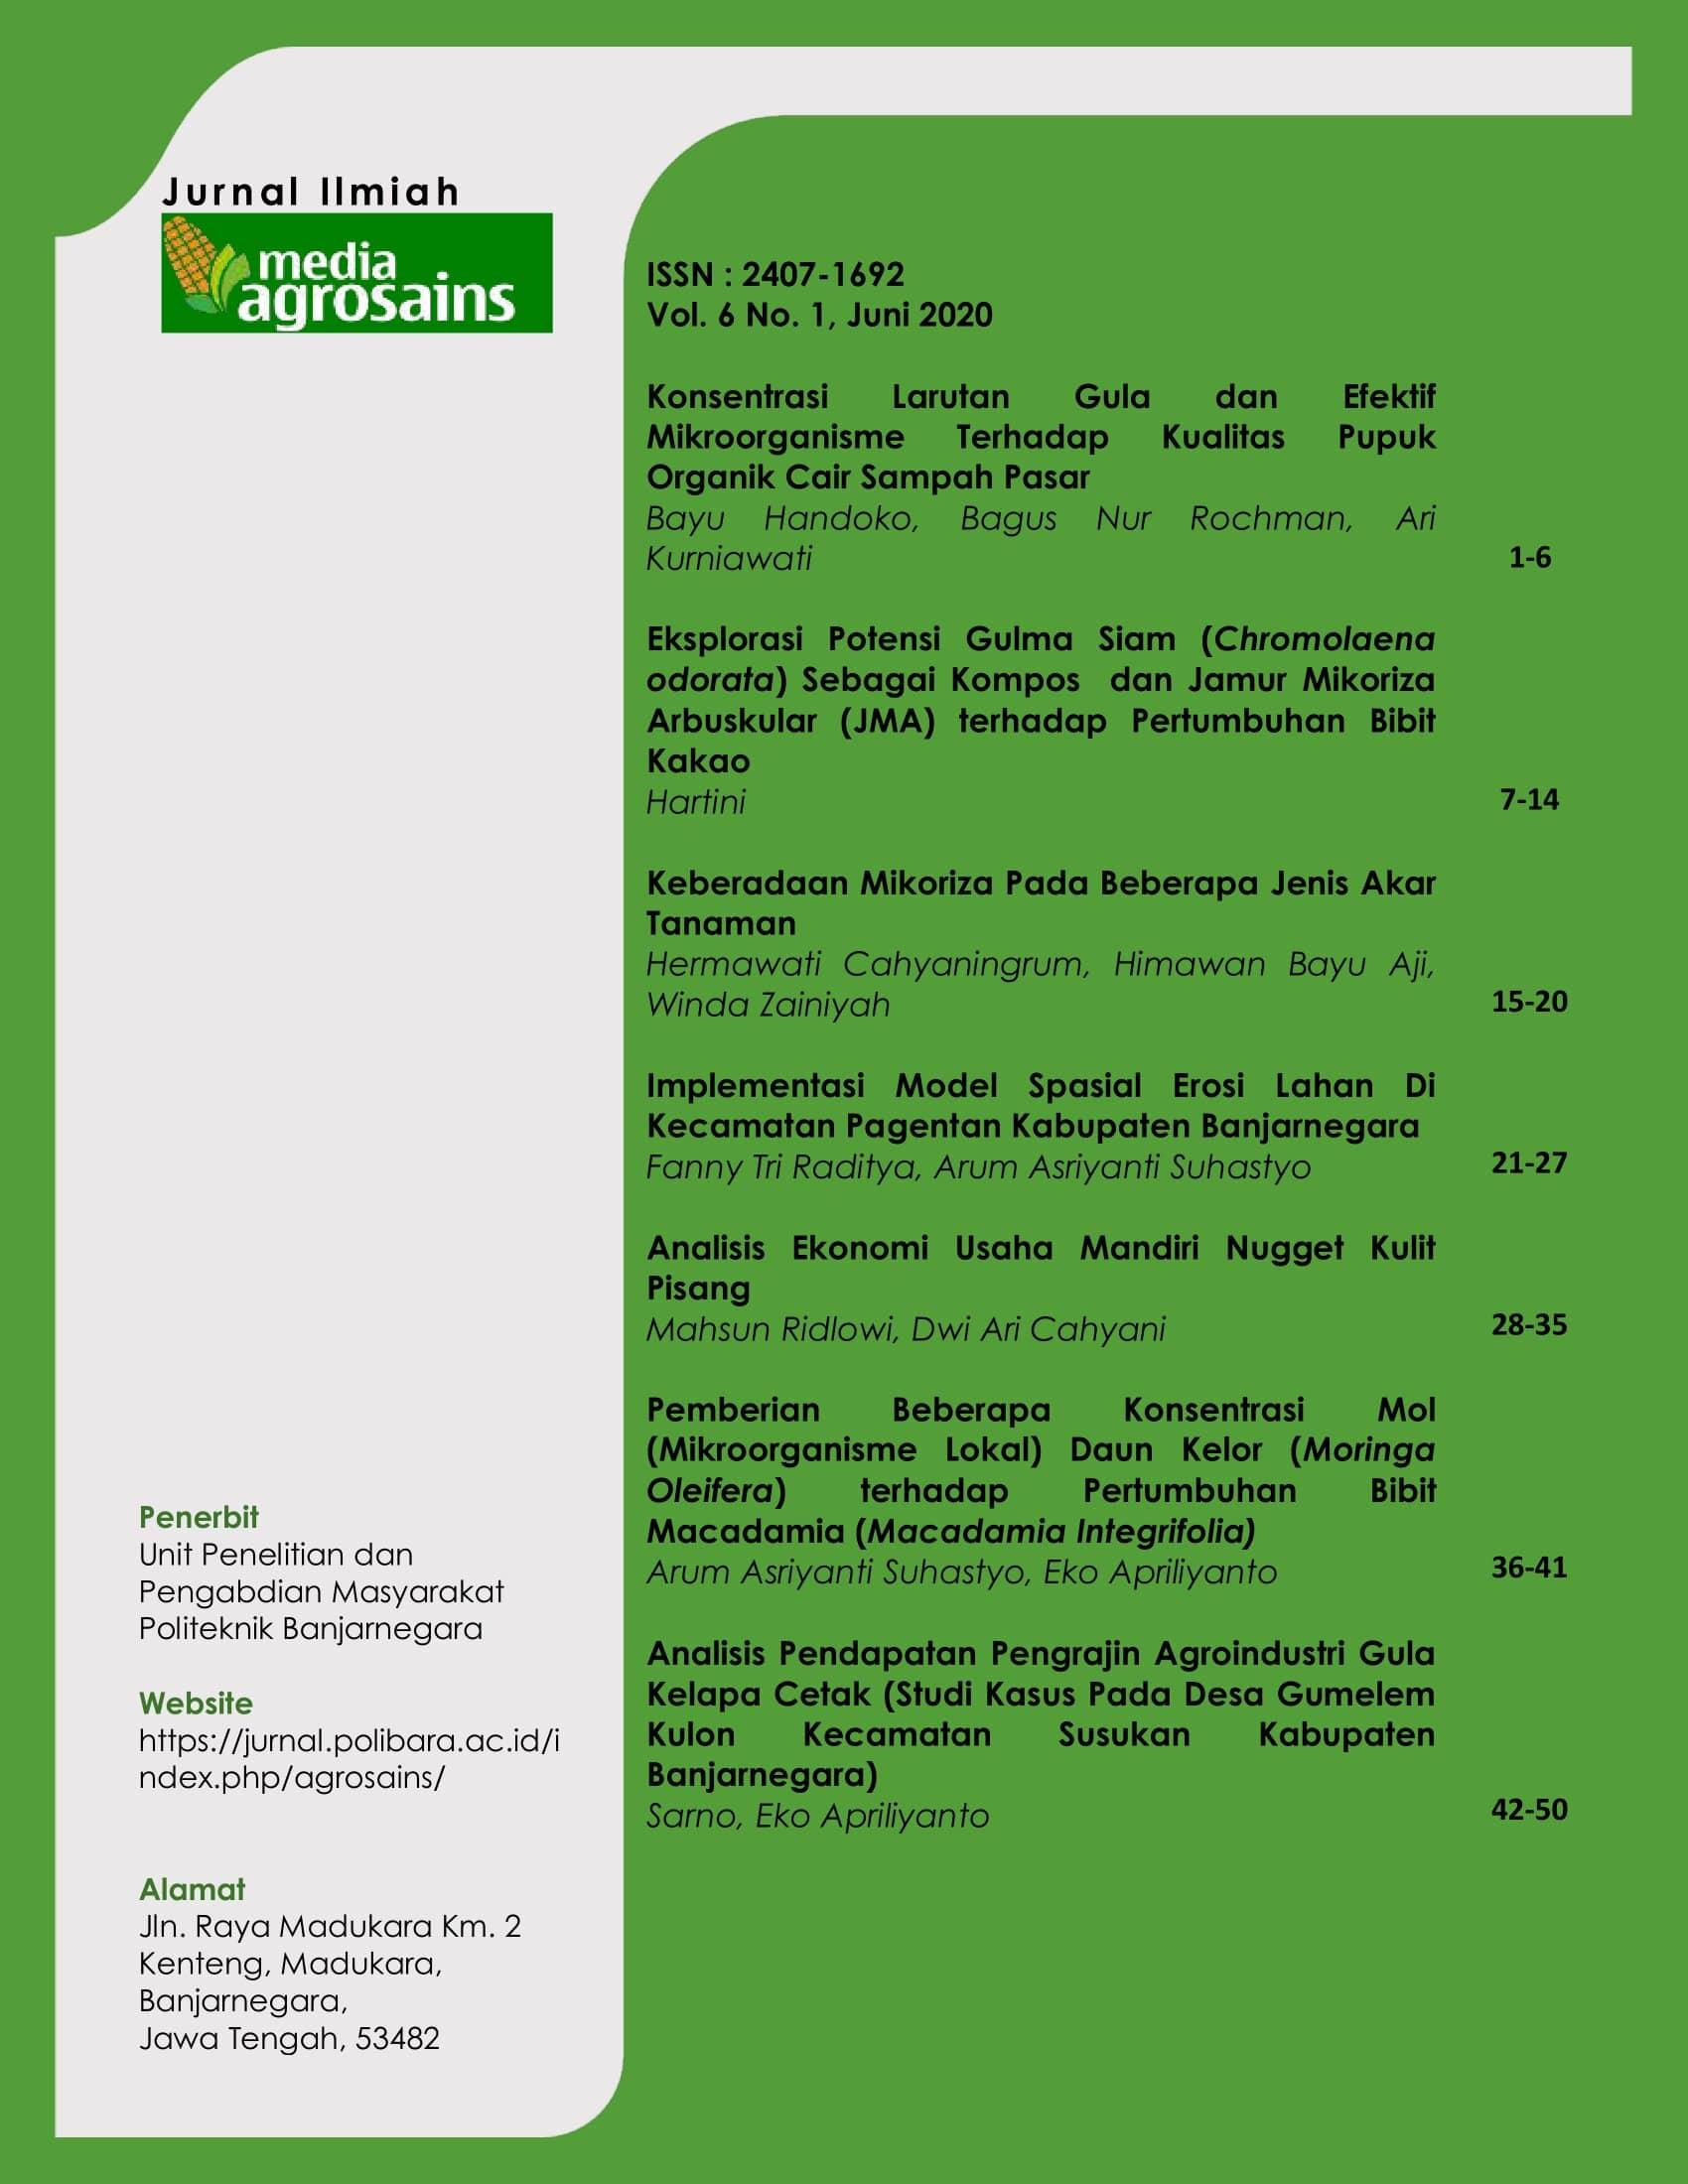 Jurnal Ilmiah Media Agrosains merupakan publikasi tulisan asli yang berkaitan dengan bidang pertanian secara luas, dalam Bahasa Indonesia. Naskah dapat berupa hasil-hasil penelitian mutakhir dan artikel konseptual.